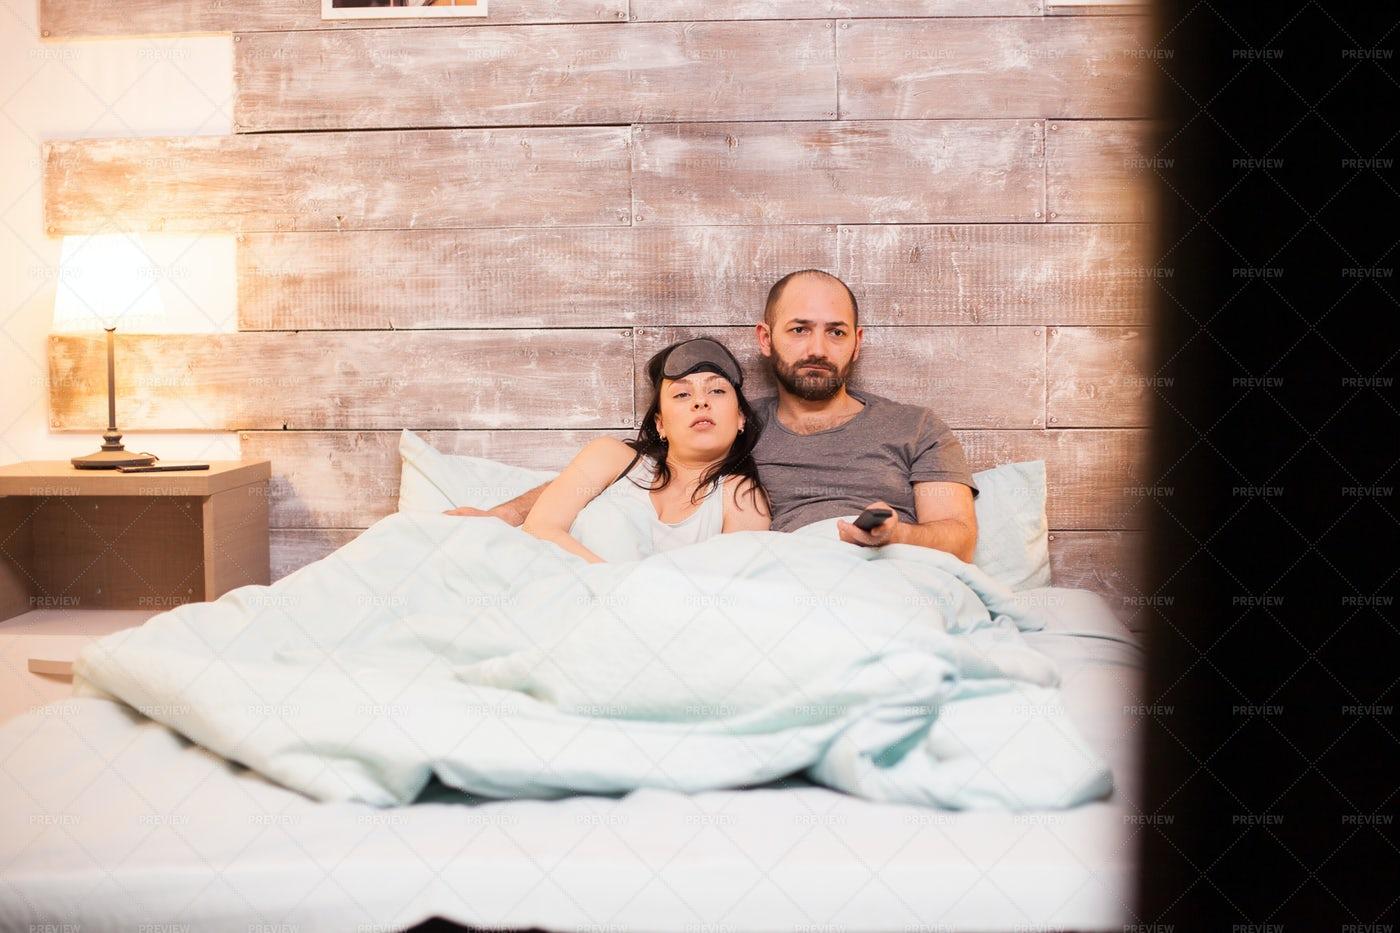 Couple Watching TV At Night: Stock Photos